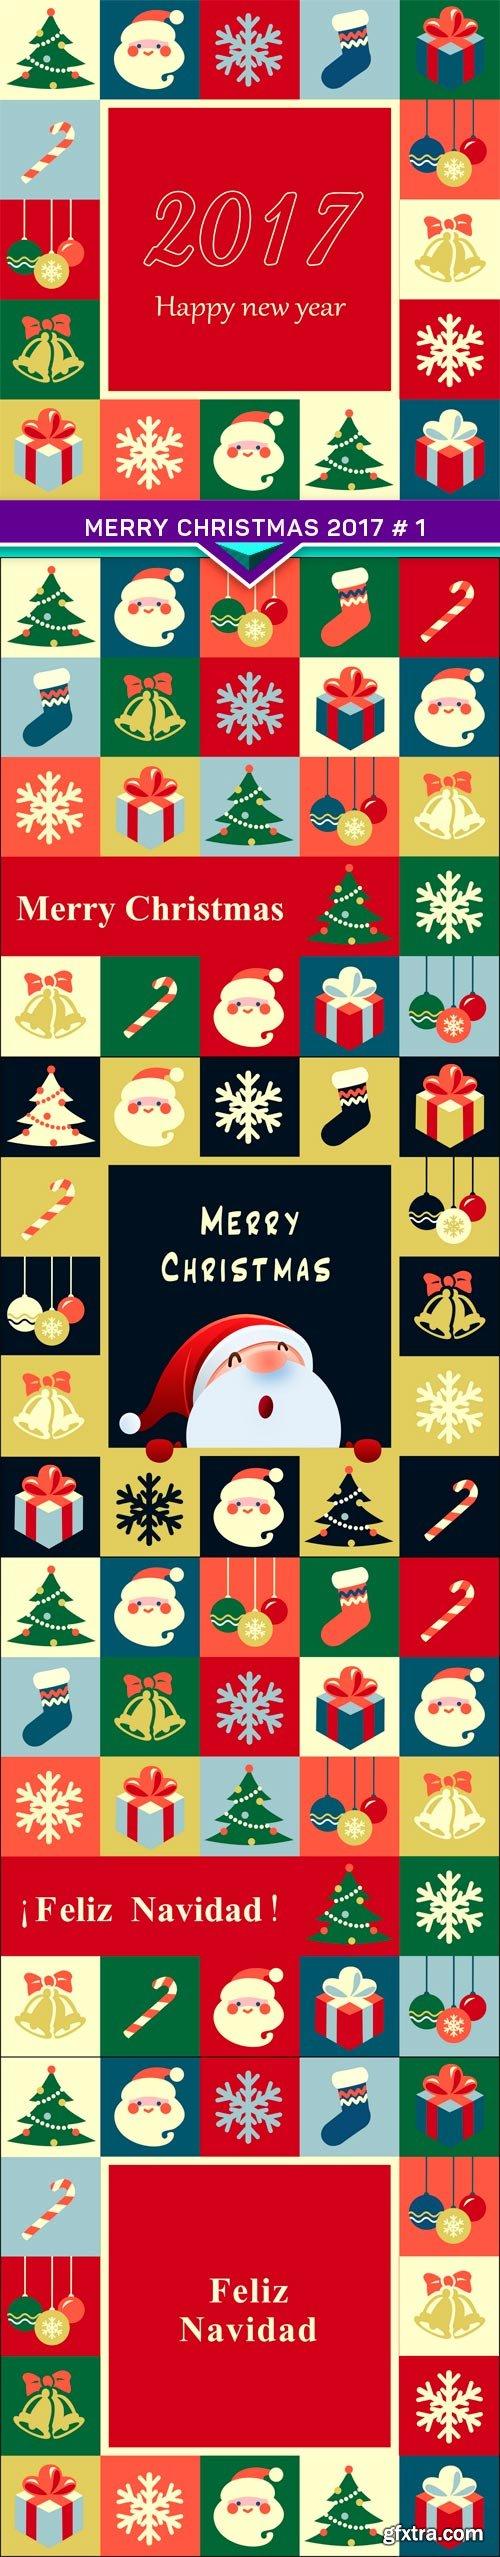 Merry Christmas 2017 # 1 5X JPEG